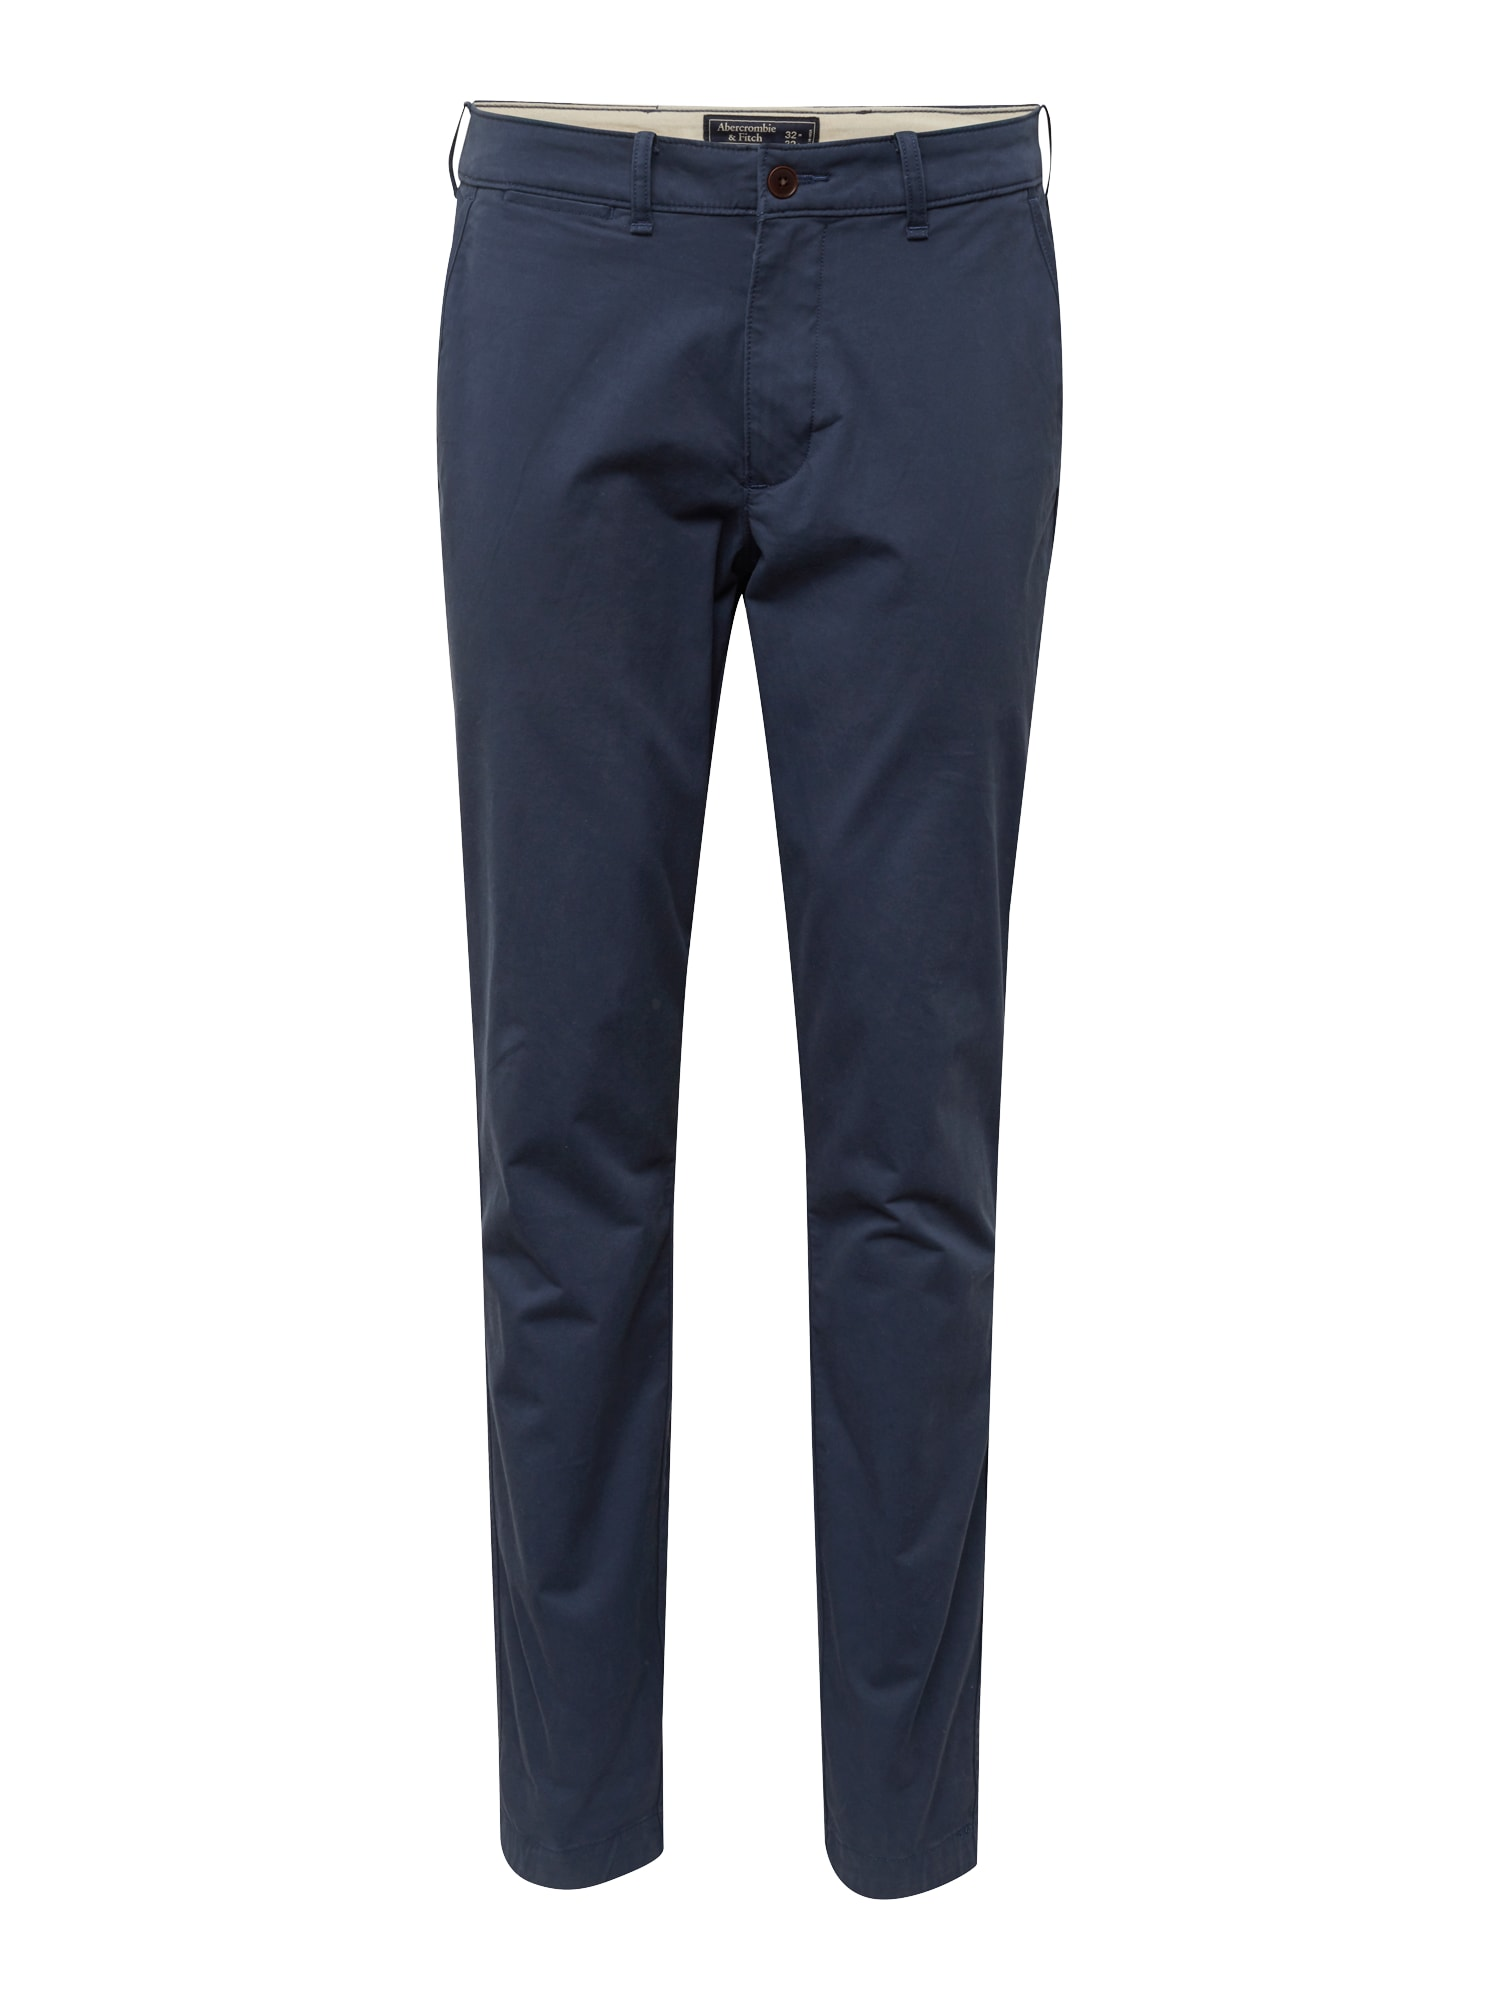 Abercrombie & Fitch Chino stiliaus kelnės tamsiai mėlyna